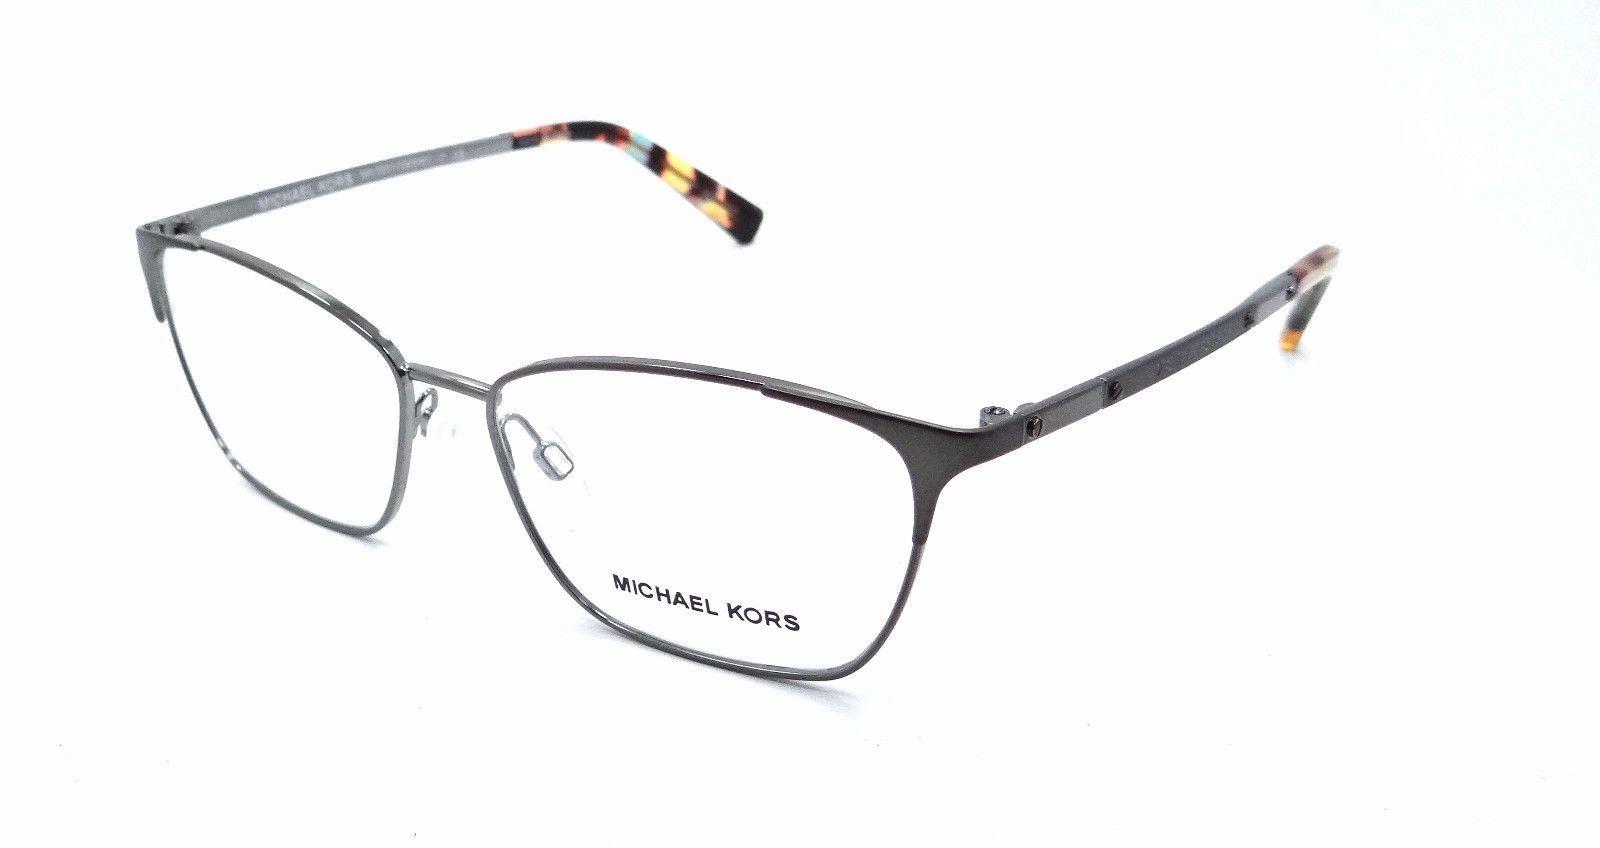 b16d9957f1 New Michael Kors Rx Eyeglasses Frames MK and 38 similar items. S l1600